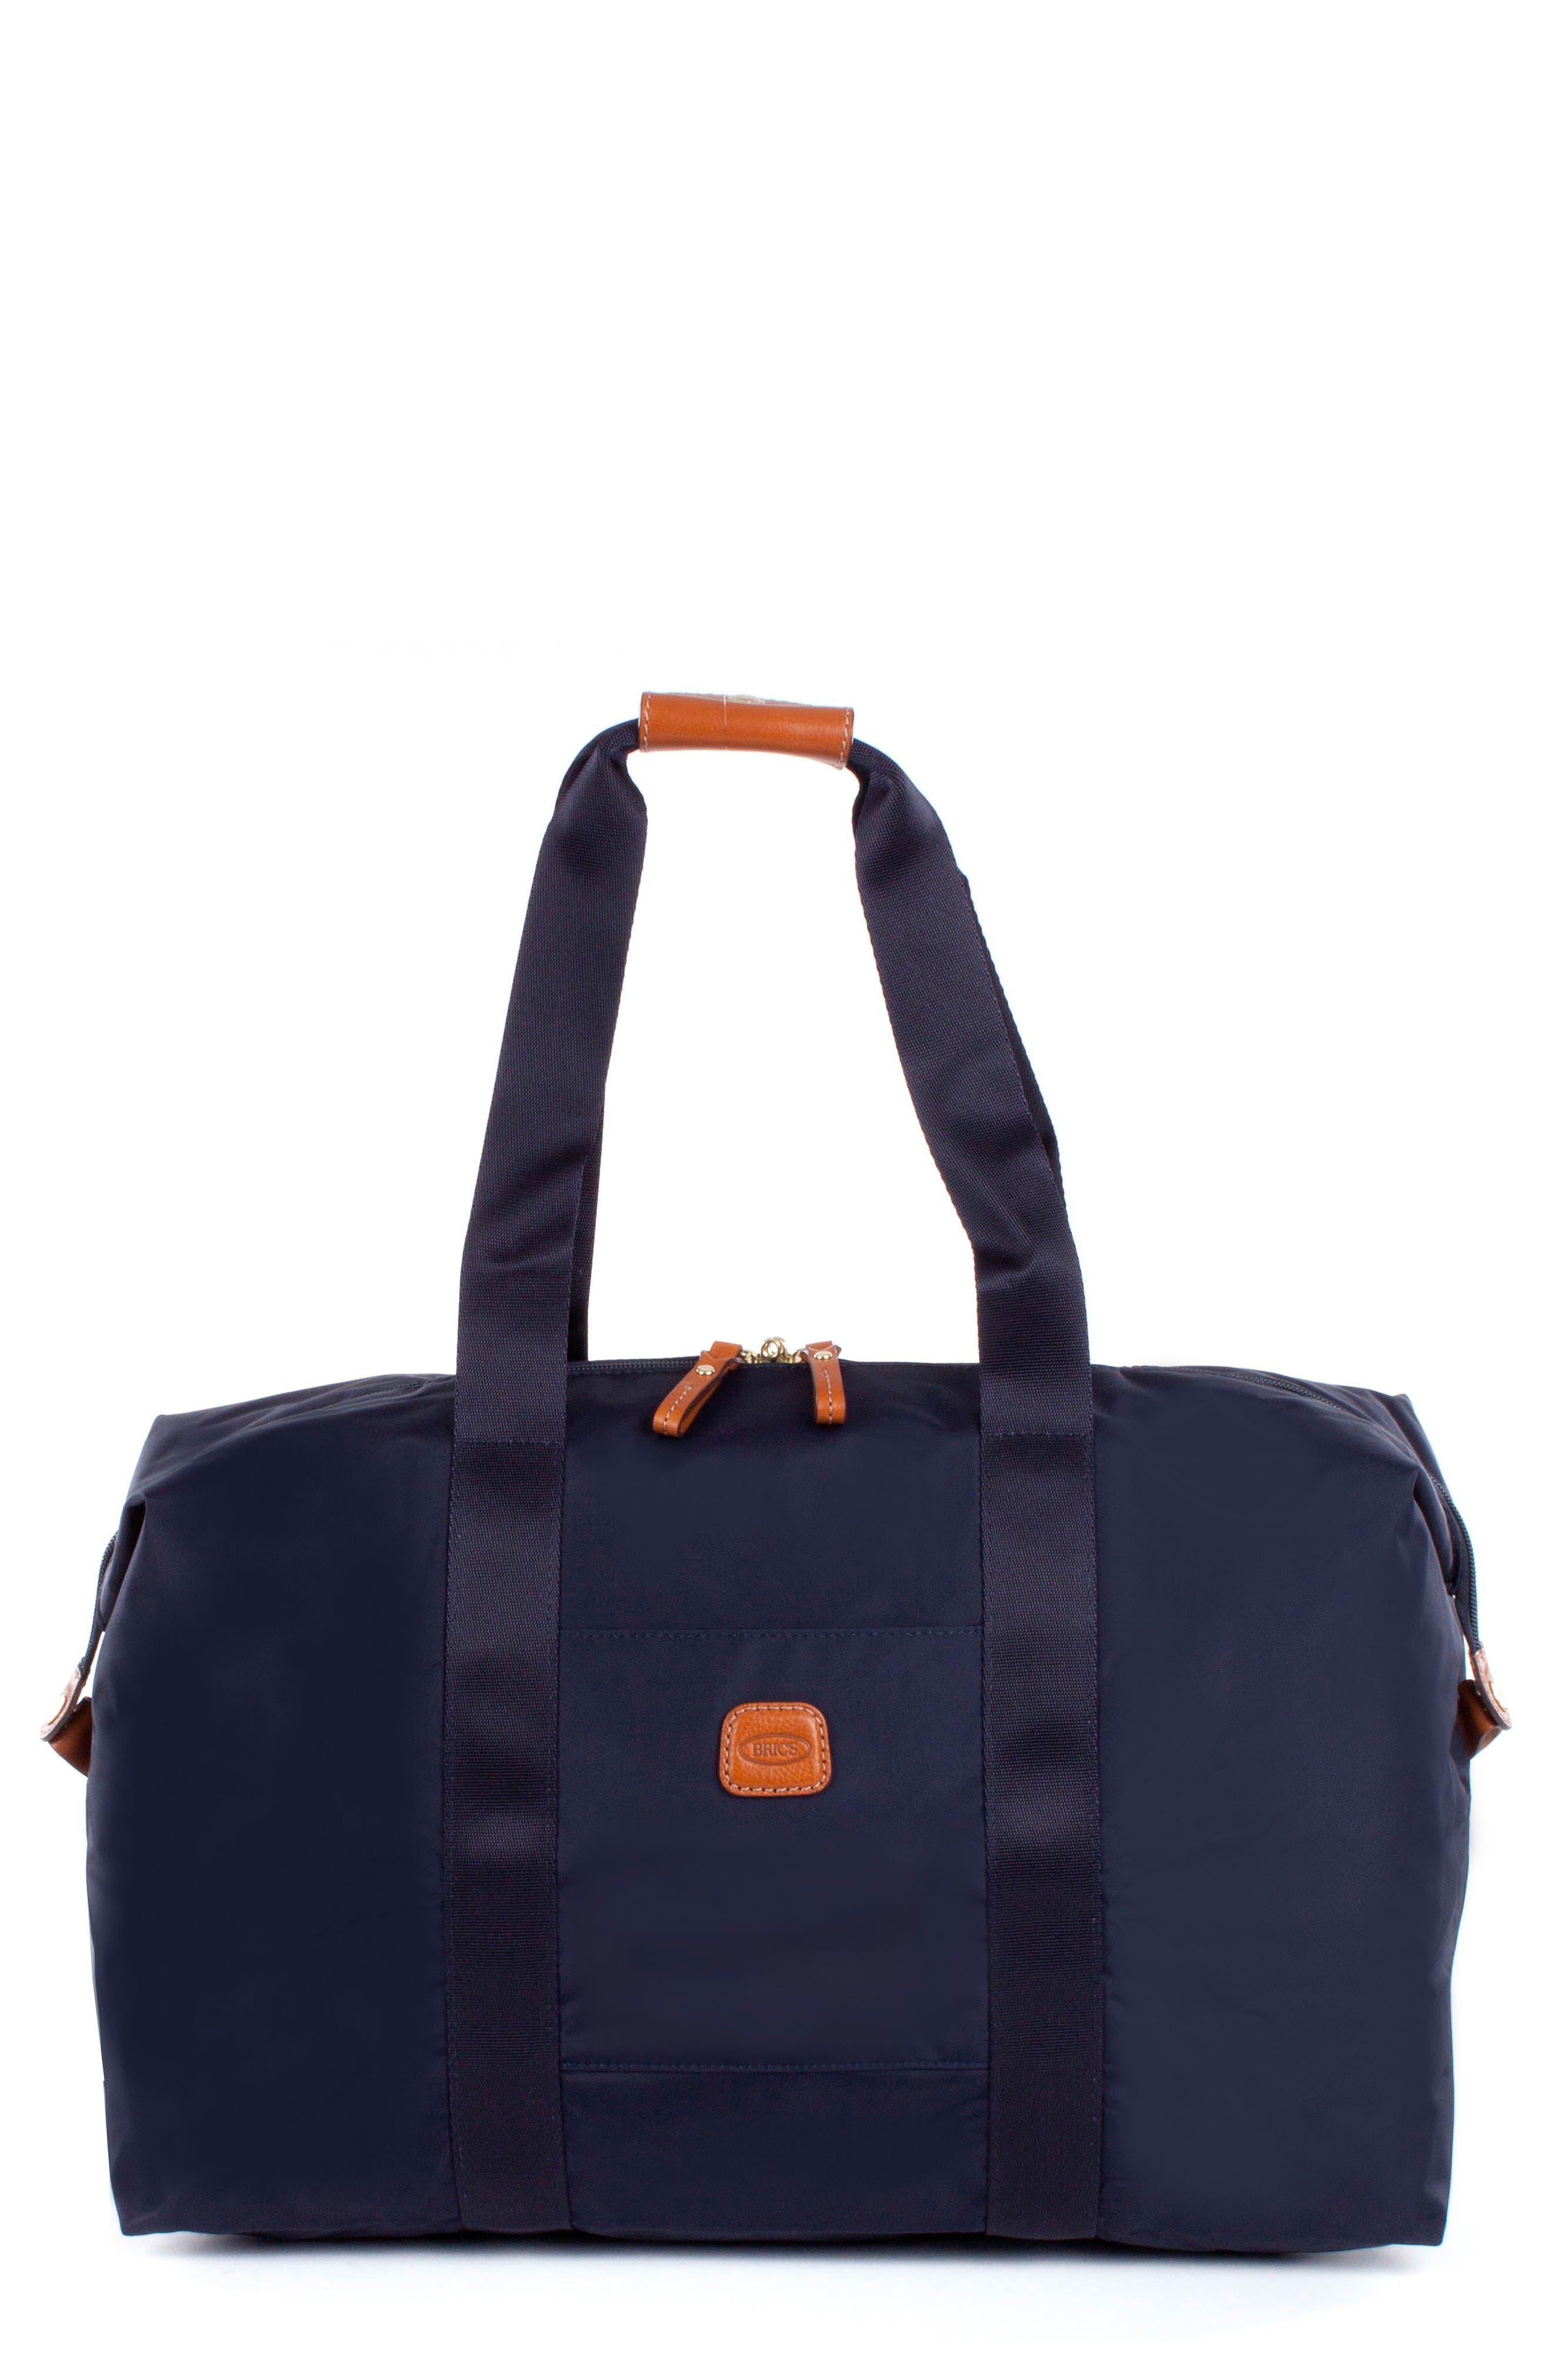 'X-Bag' Folding Duffel Bag,                             Alternate thumbnail 6, color,                             410